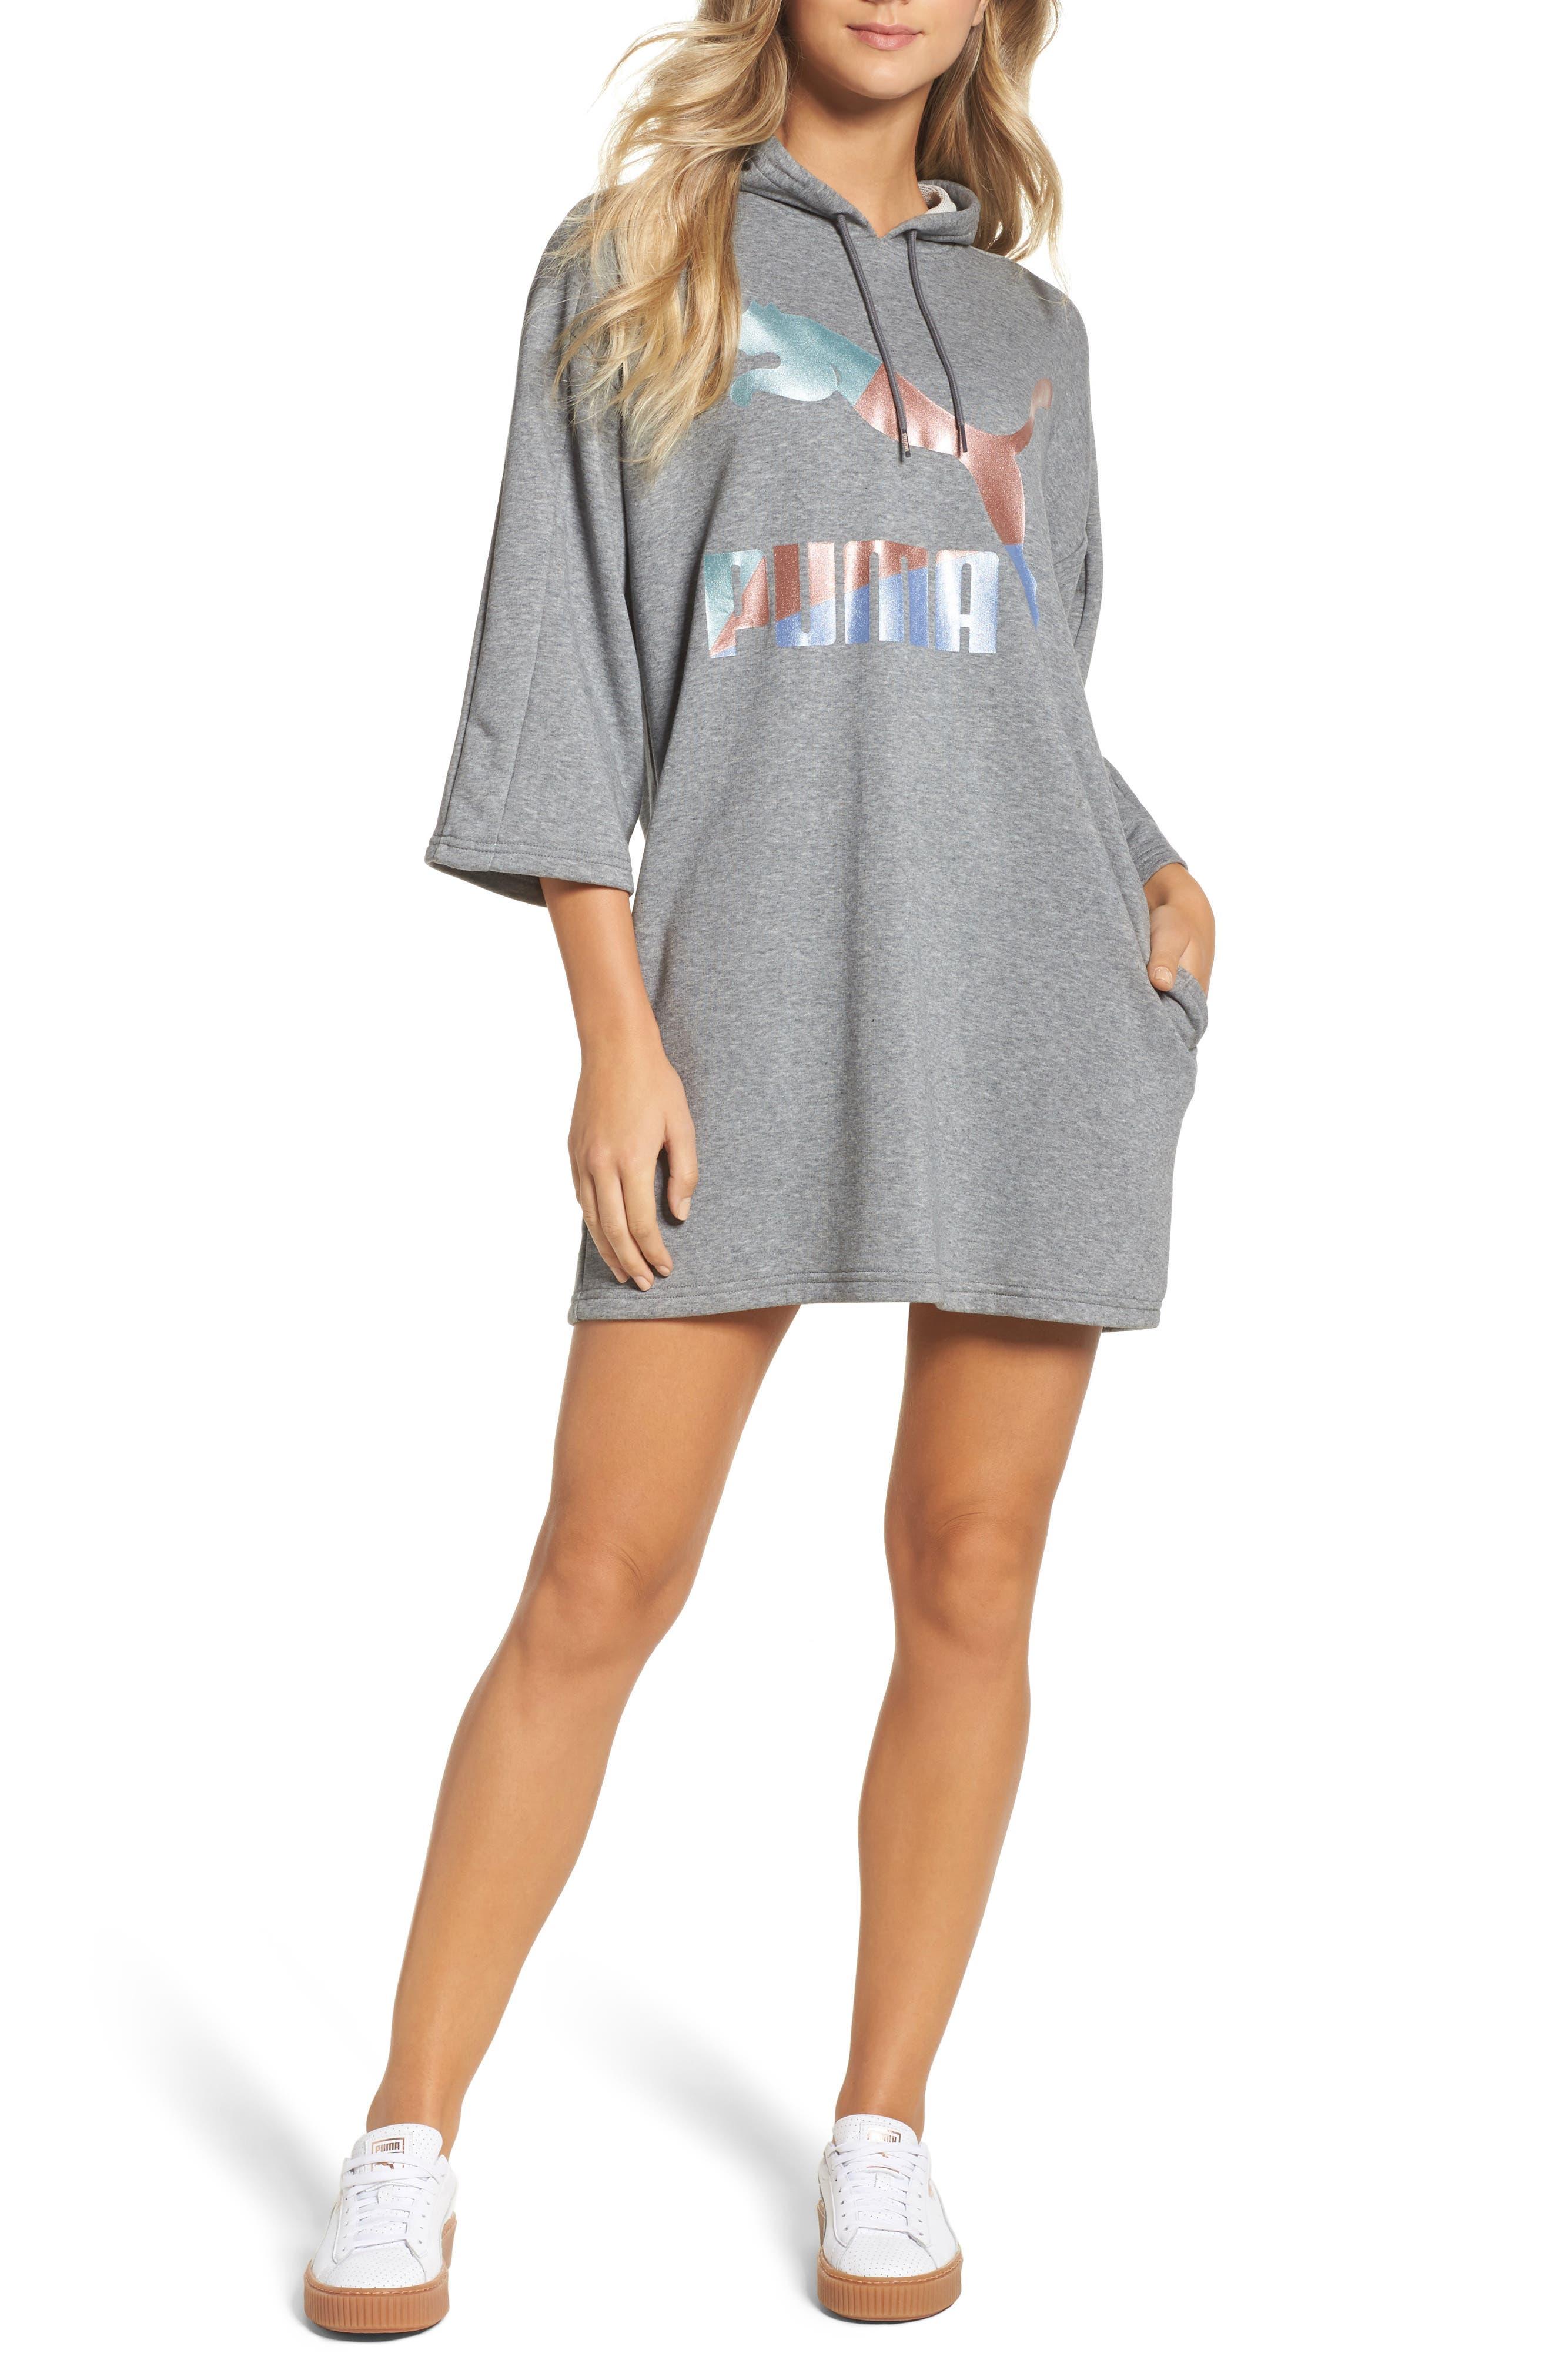 Alternate Image 1 Selected - PUMA Glam Oversize Hooded Dress